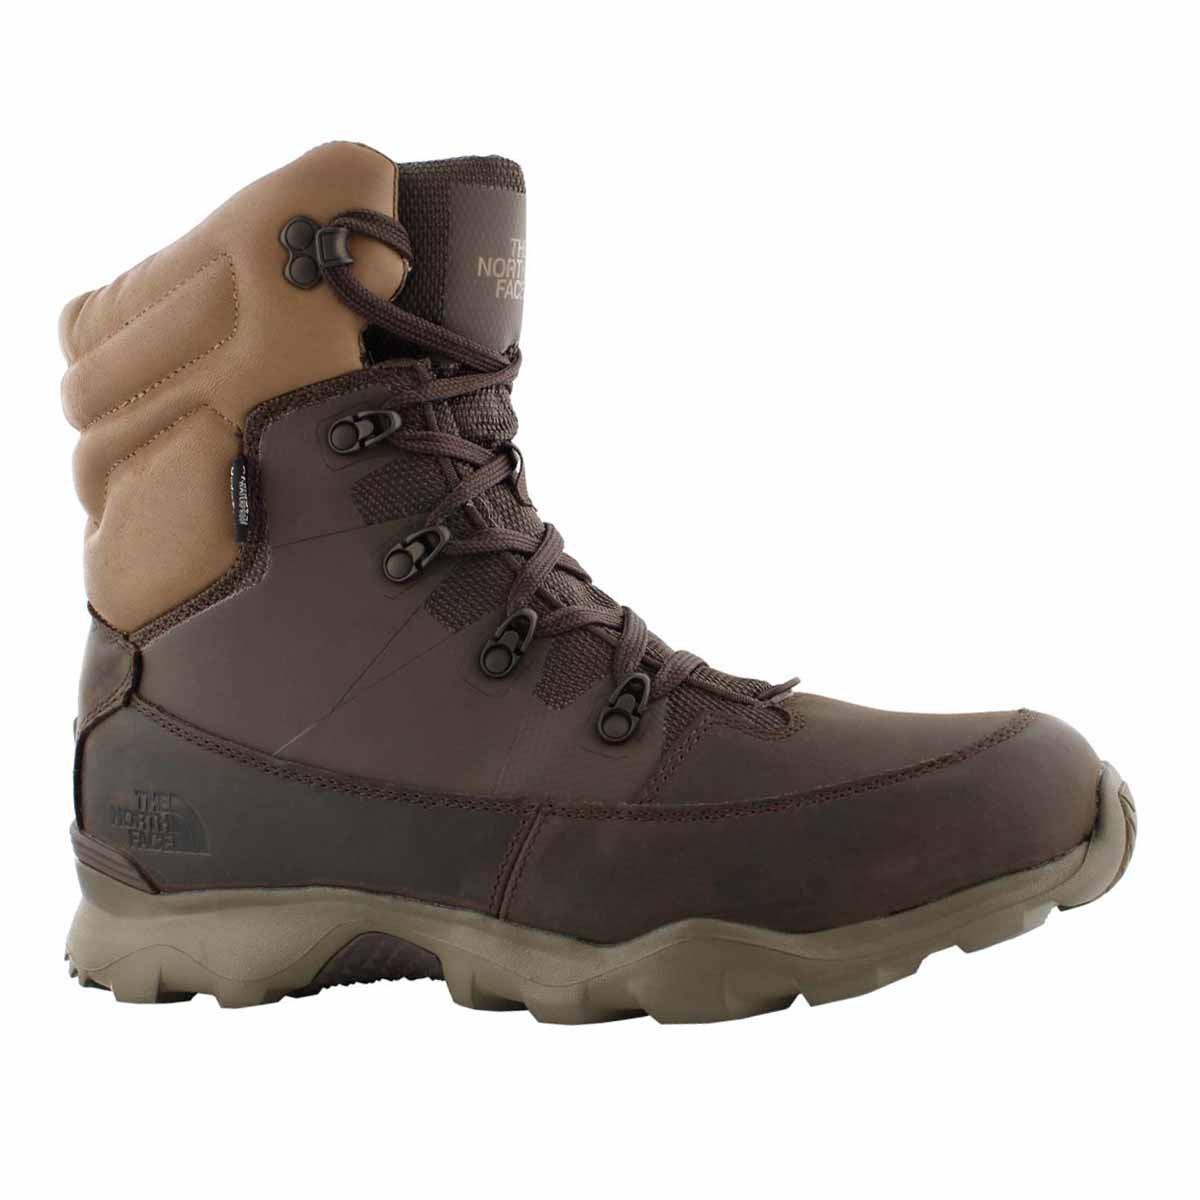 Mns ThermoBall Lifty brn/khaki wntr boot